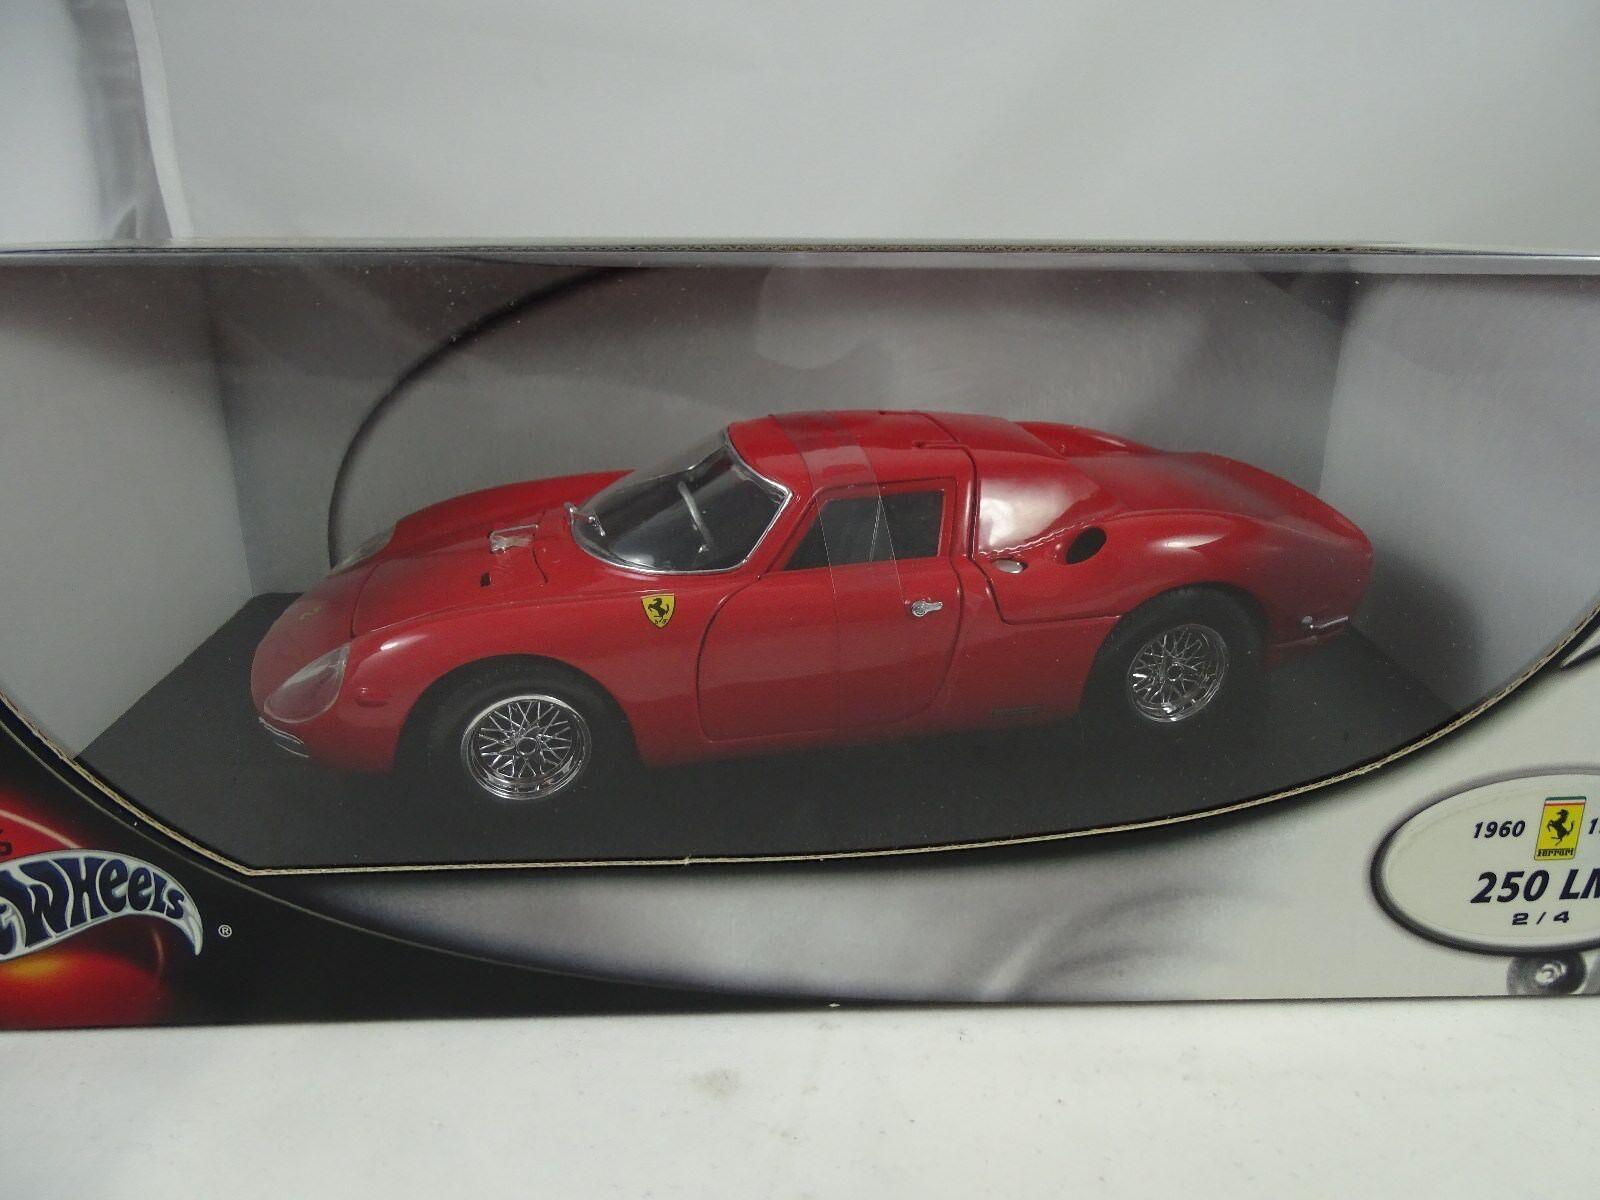 1 18 Hot Wheels Ferrari 1960 1969 250Lm 2 4 rosso - Rareza§